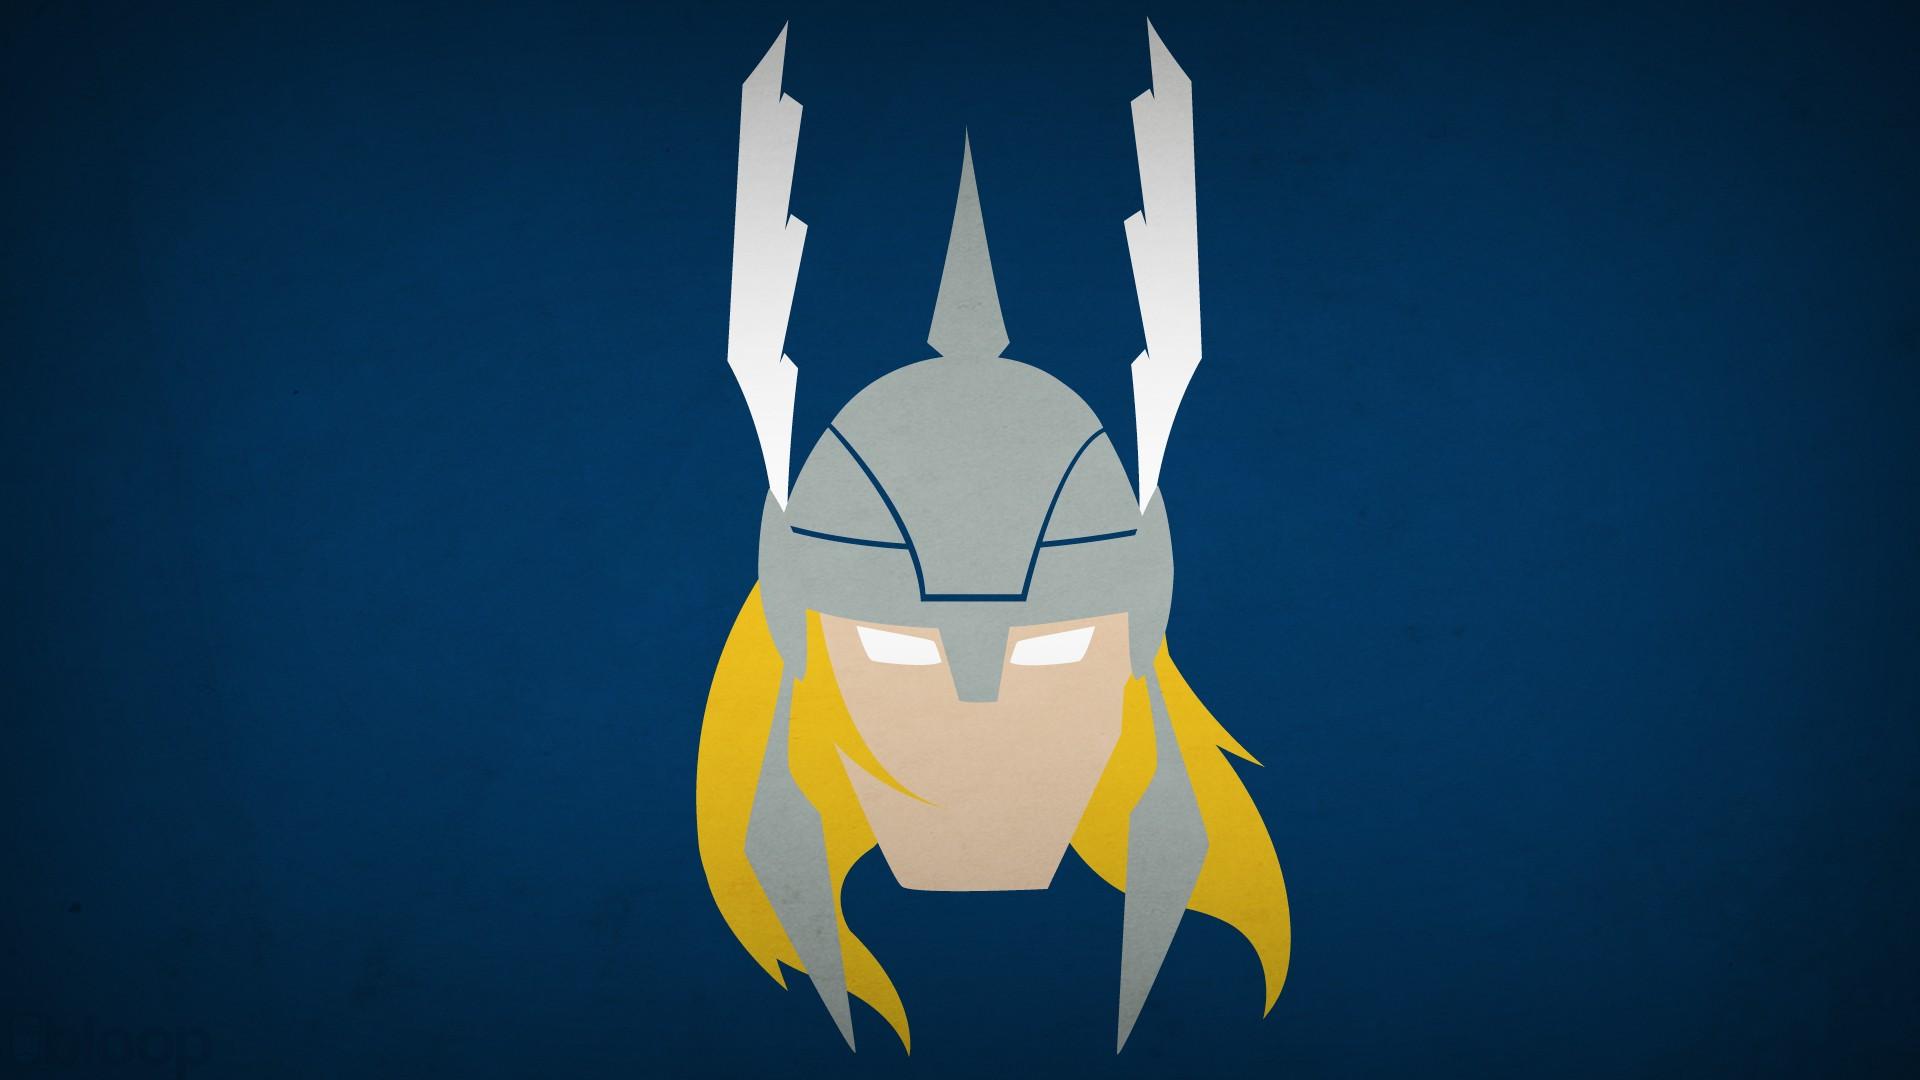 Beautiful Wallpaper Marvel Simple - illustration-Thor-simple-background-minimalism-blue-background-blue-cartoon-helmet-hero-superhero-Marvel-Comics-Blo0p-hand-wing-screenshot-computer-wallpaper-219398  Picture_194758.jpg